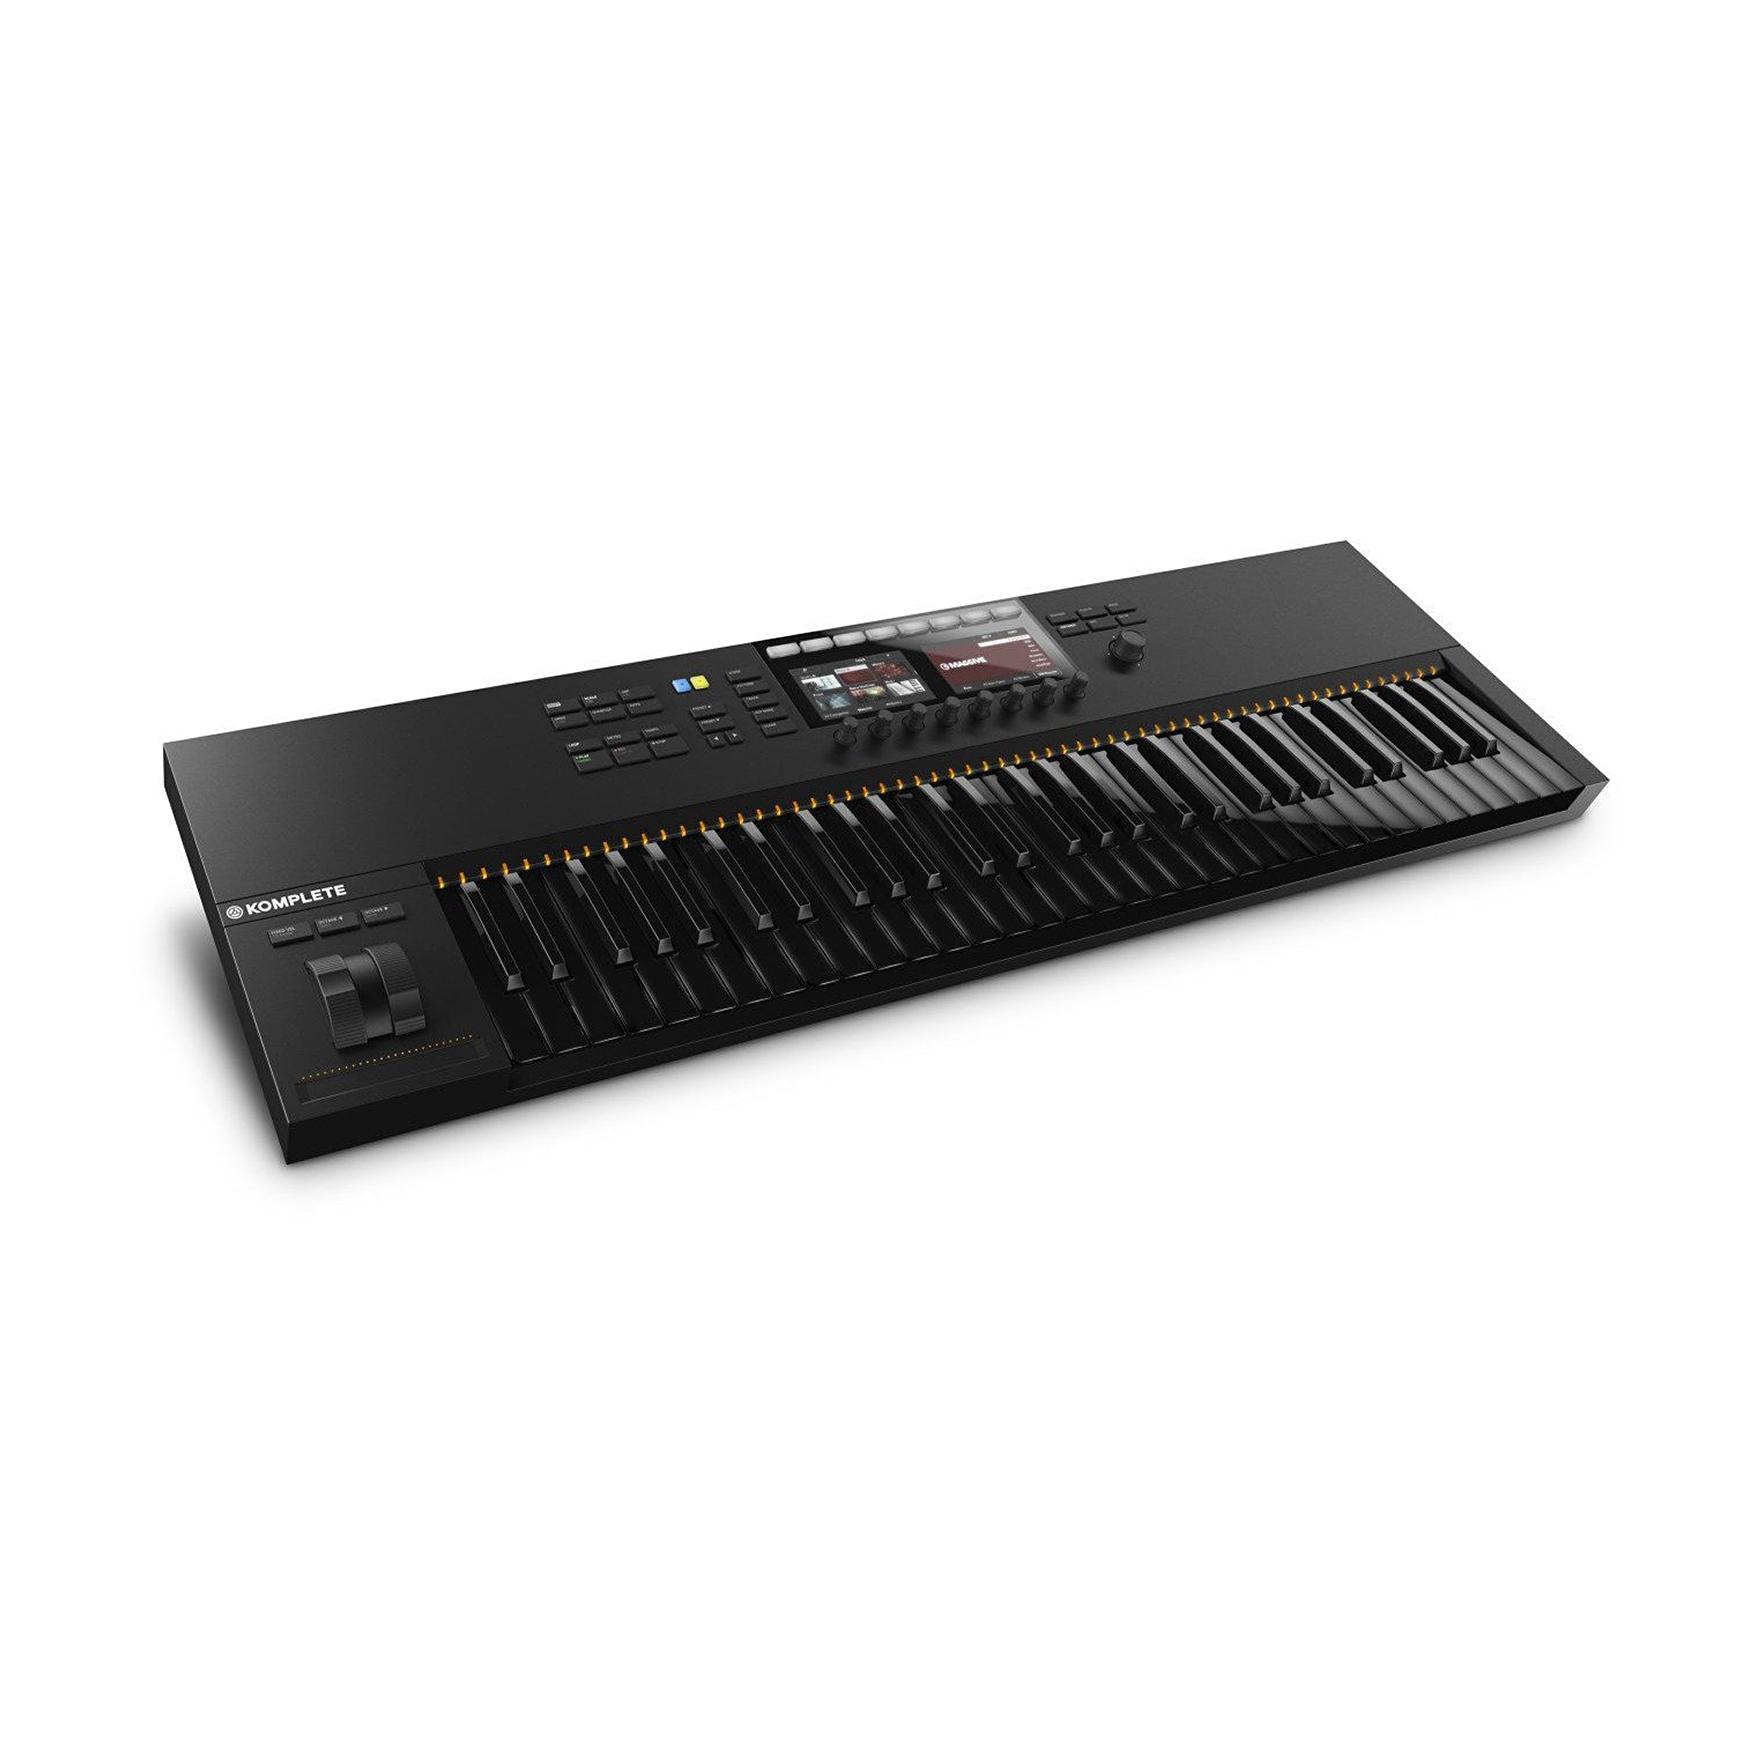 komplete-kontrol-s61-limited-edition-black-keys-photo2